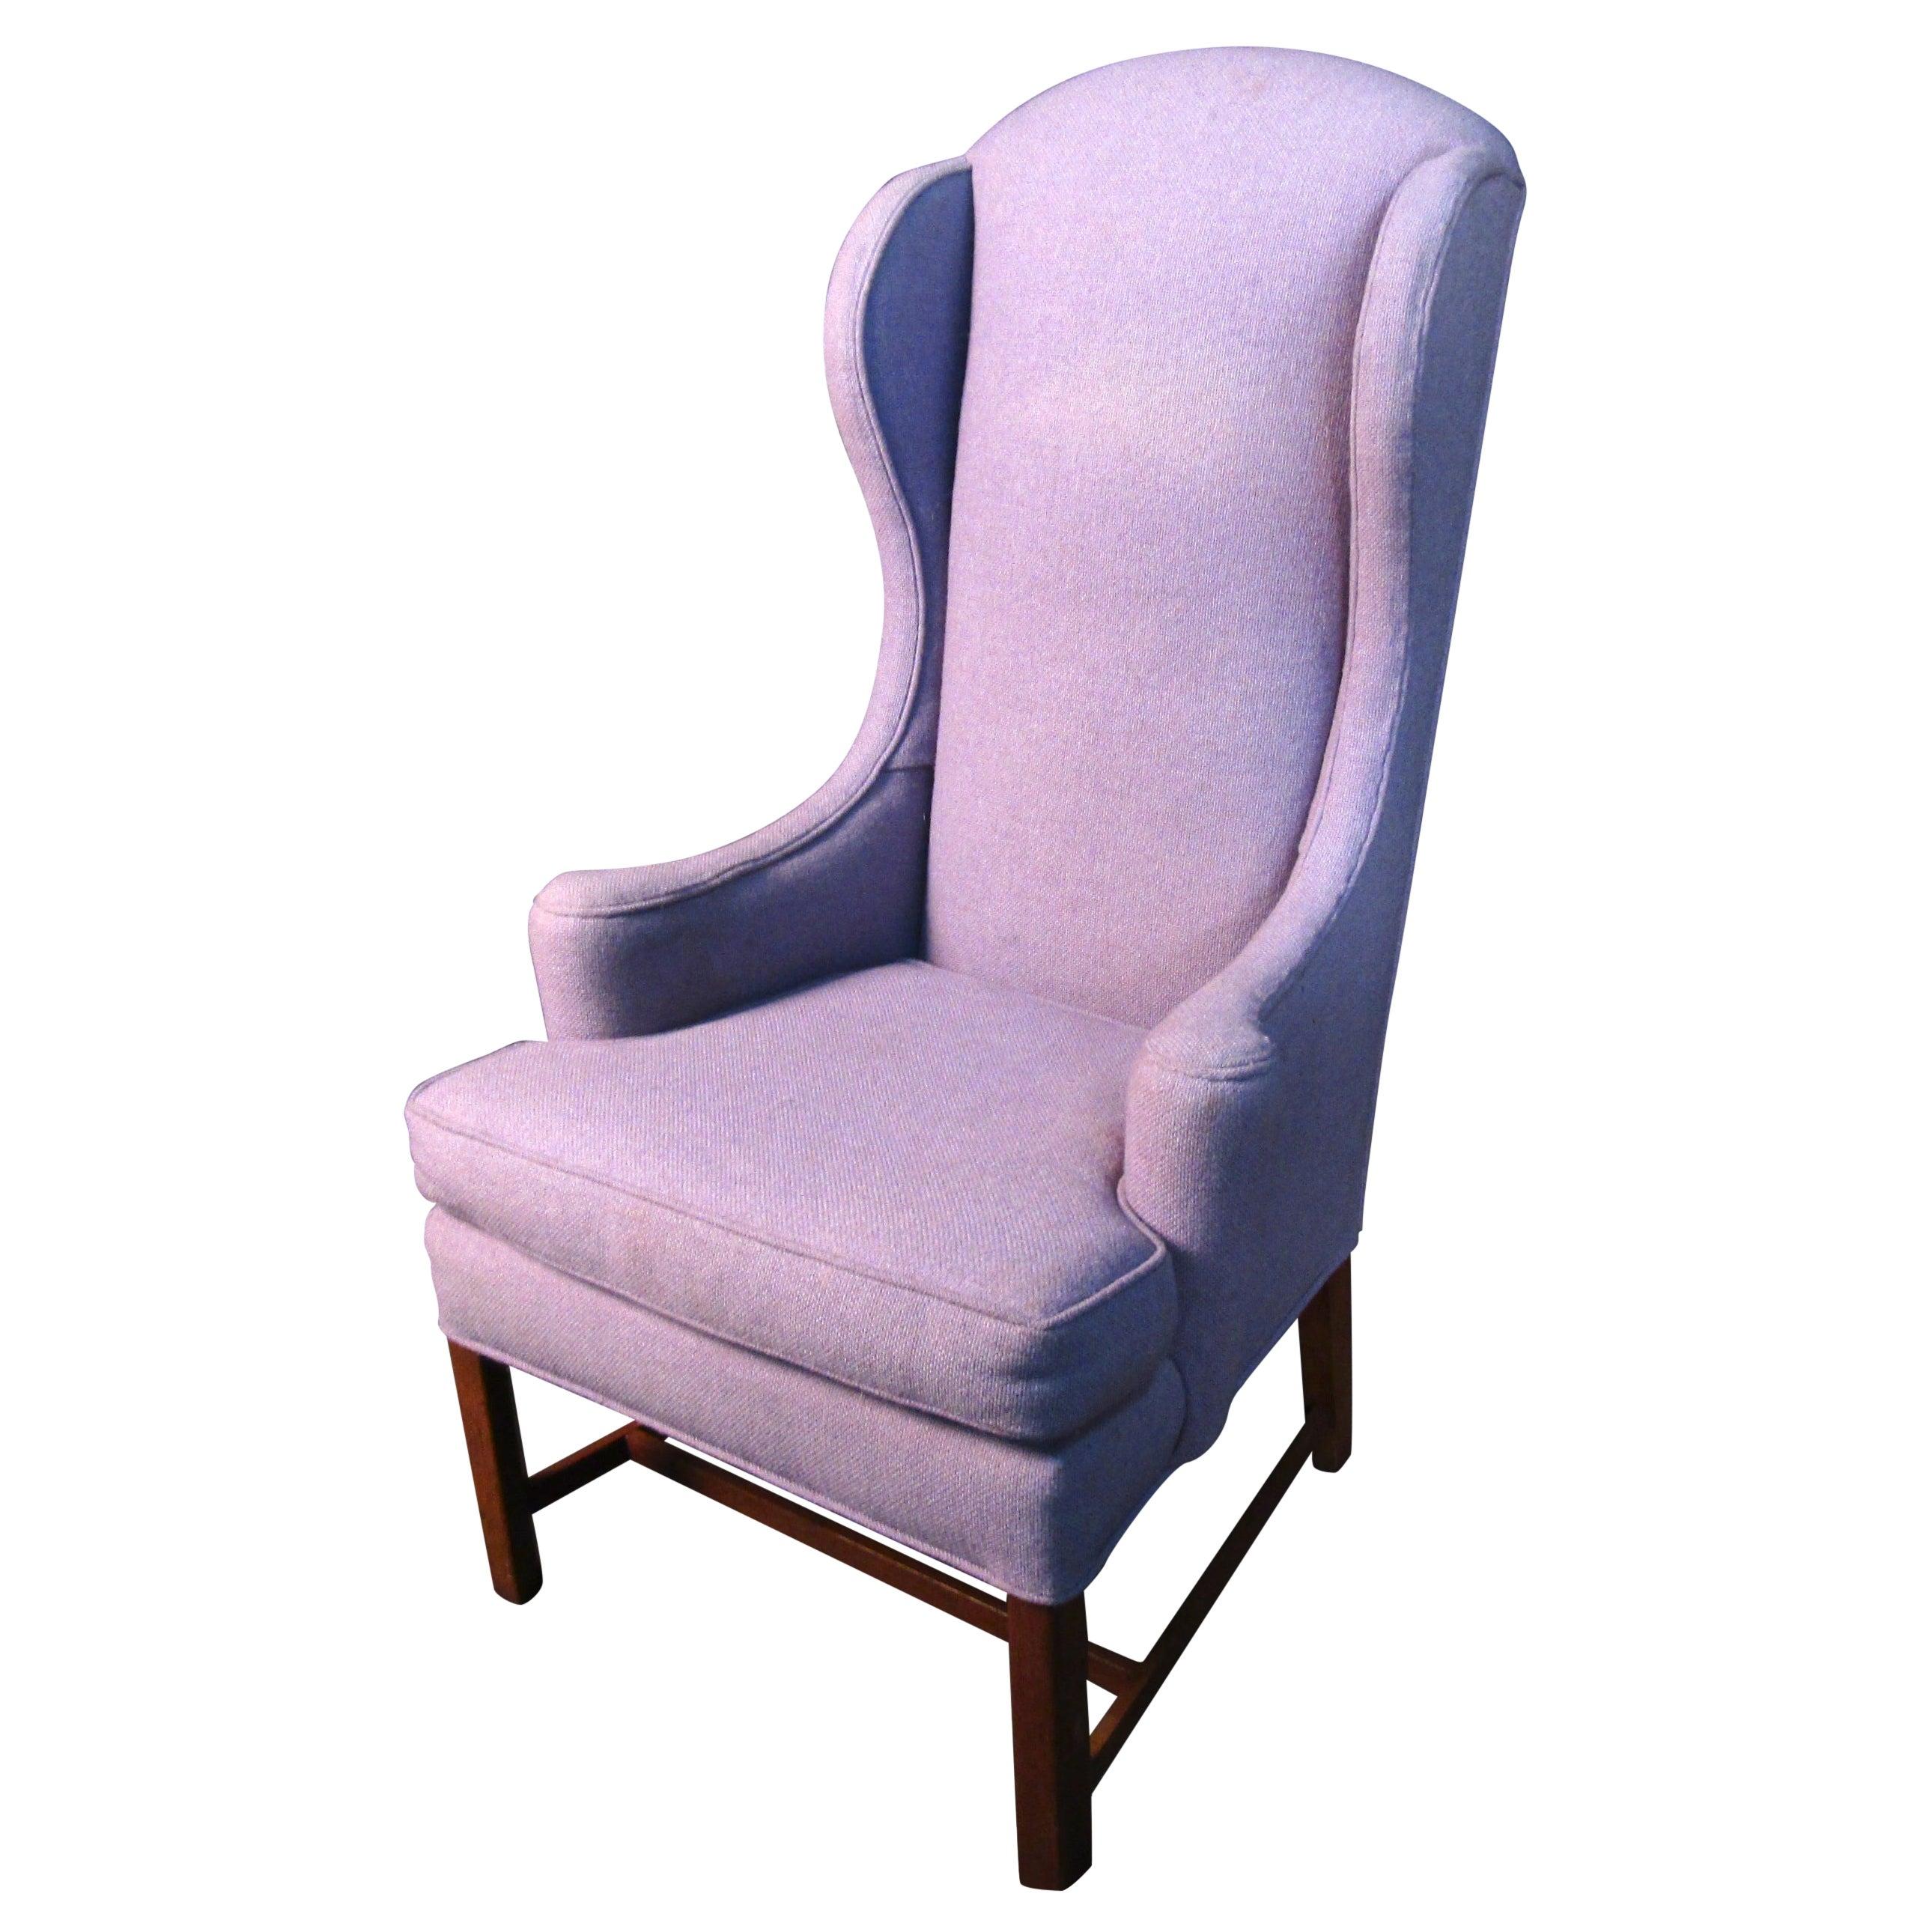 Mid-Century Modern High Back Purple Lounge Chair